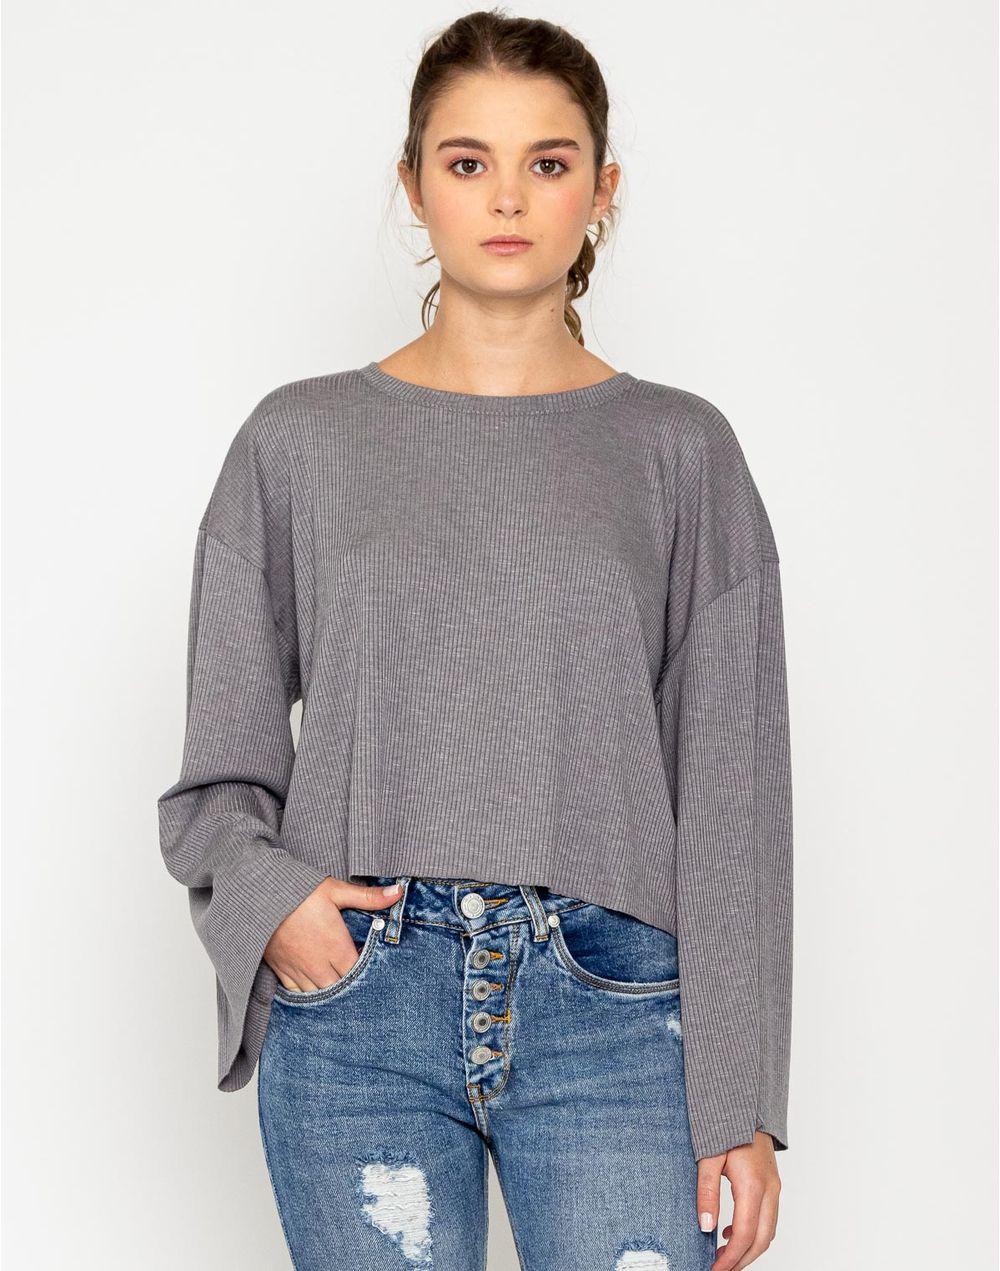 camiseta-180347-gris-1.jpg